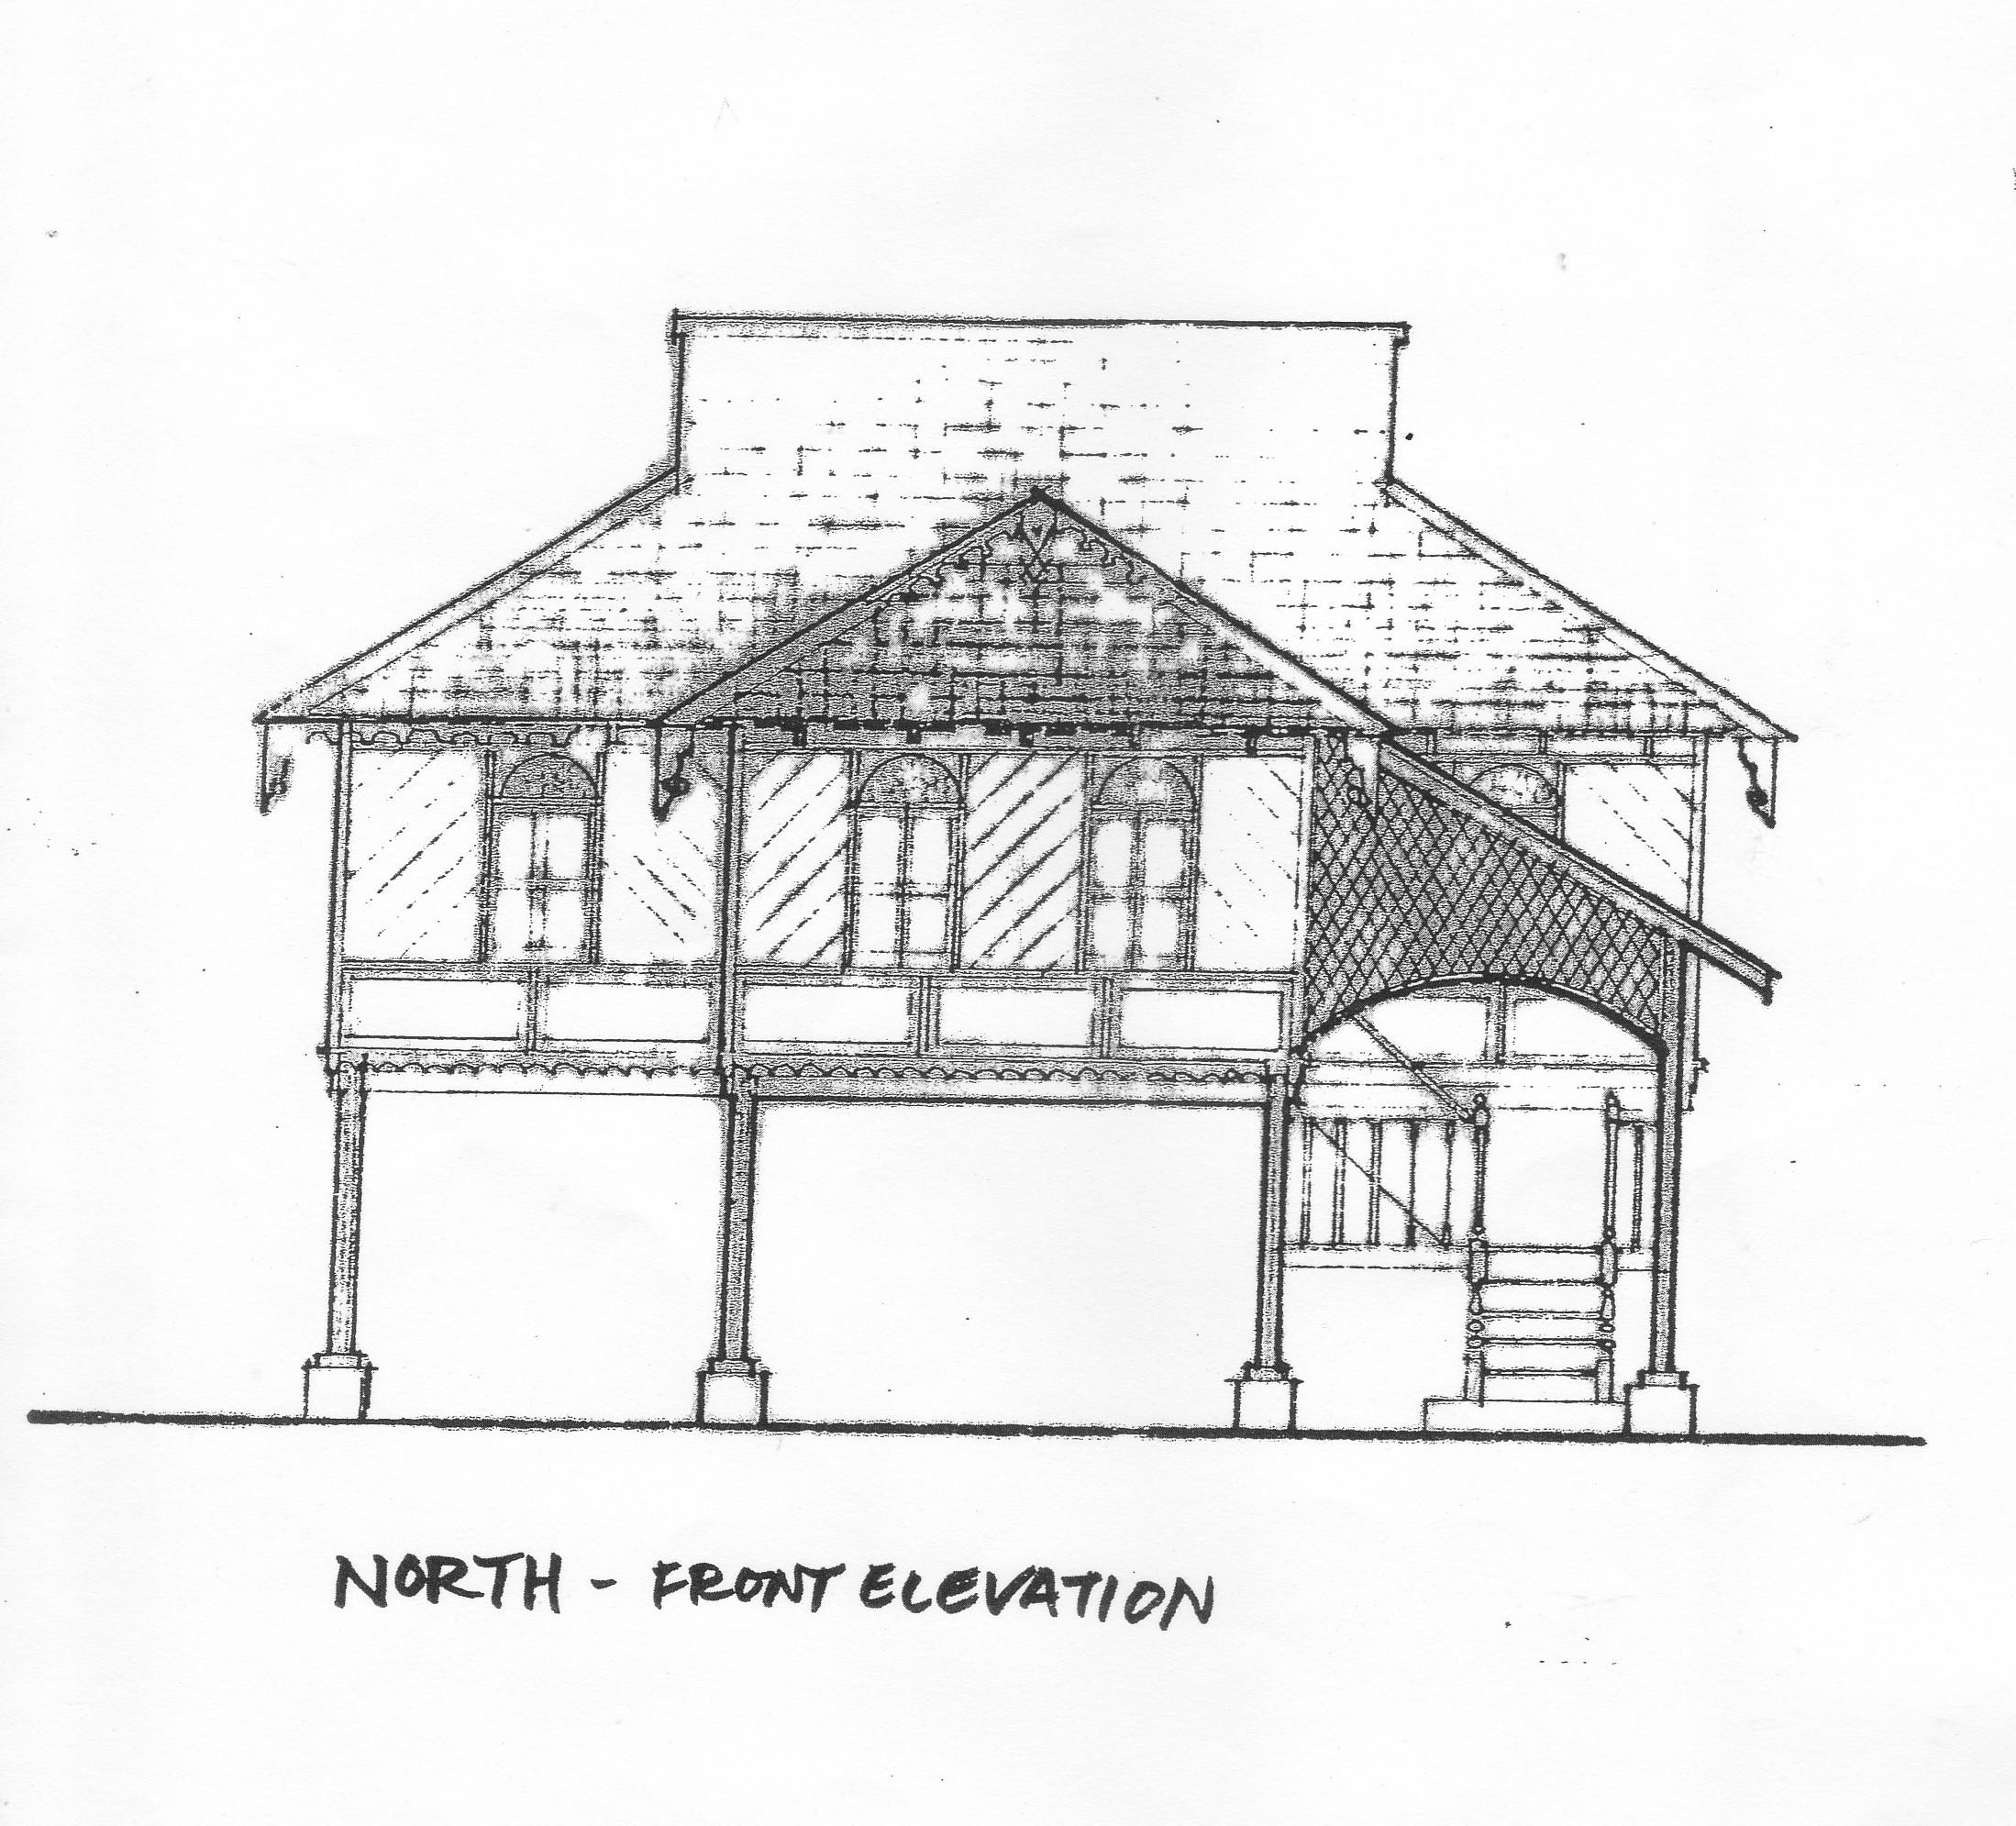 North Front Elevation Of Rumah Uda Manap